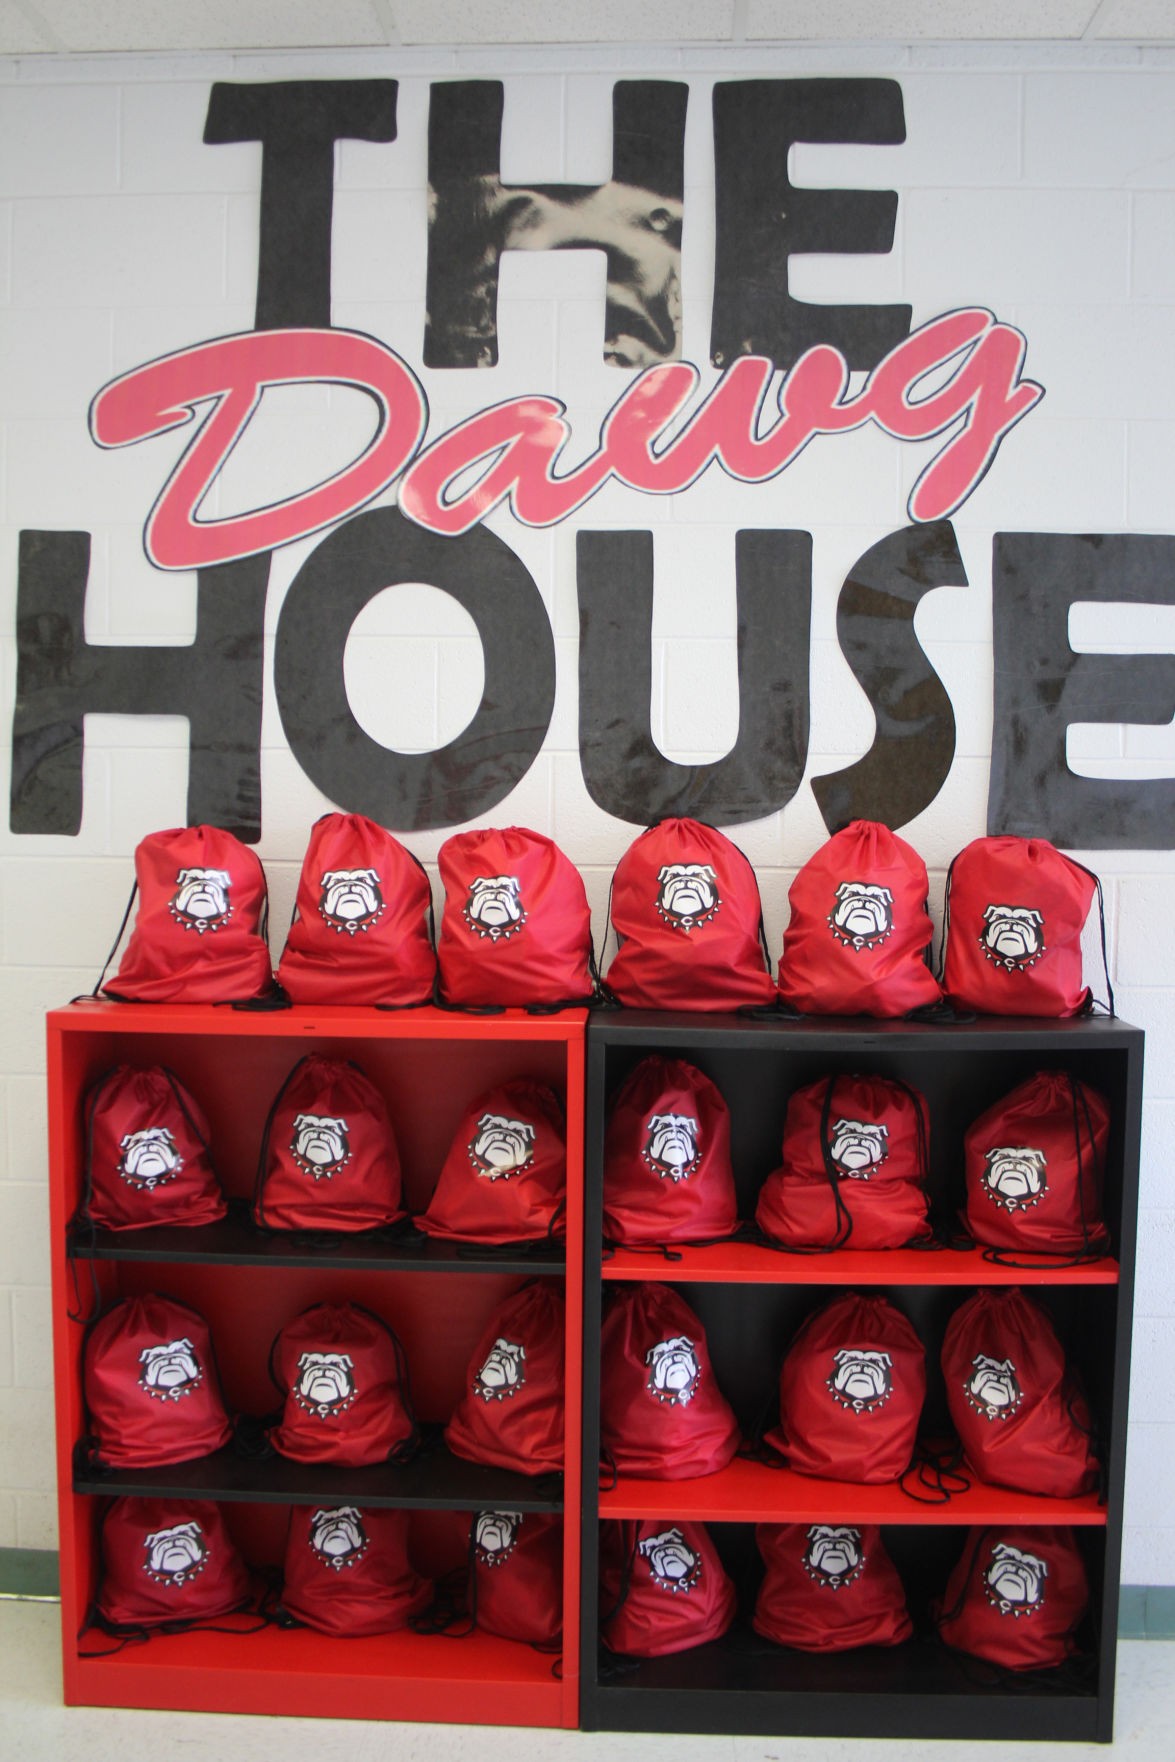 CMS The Dawg House program